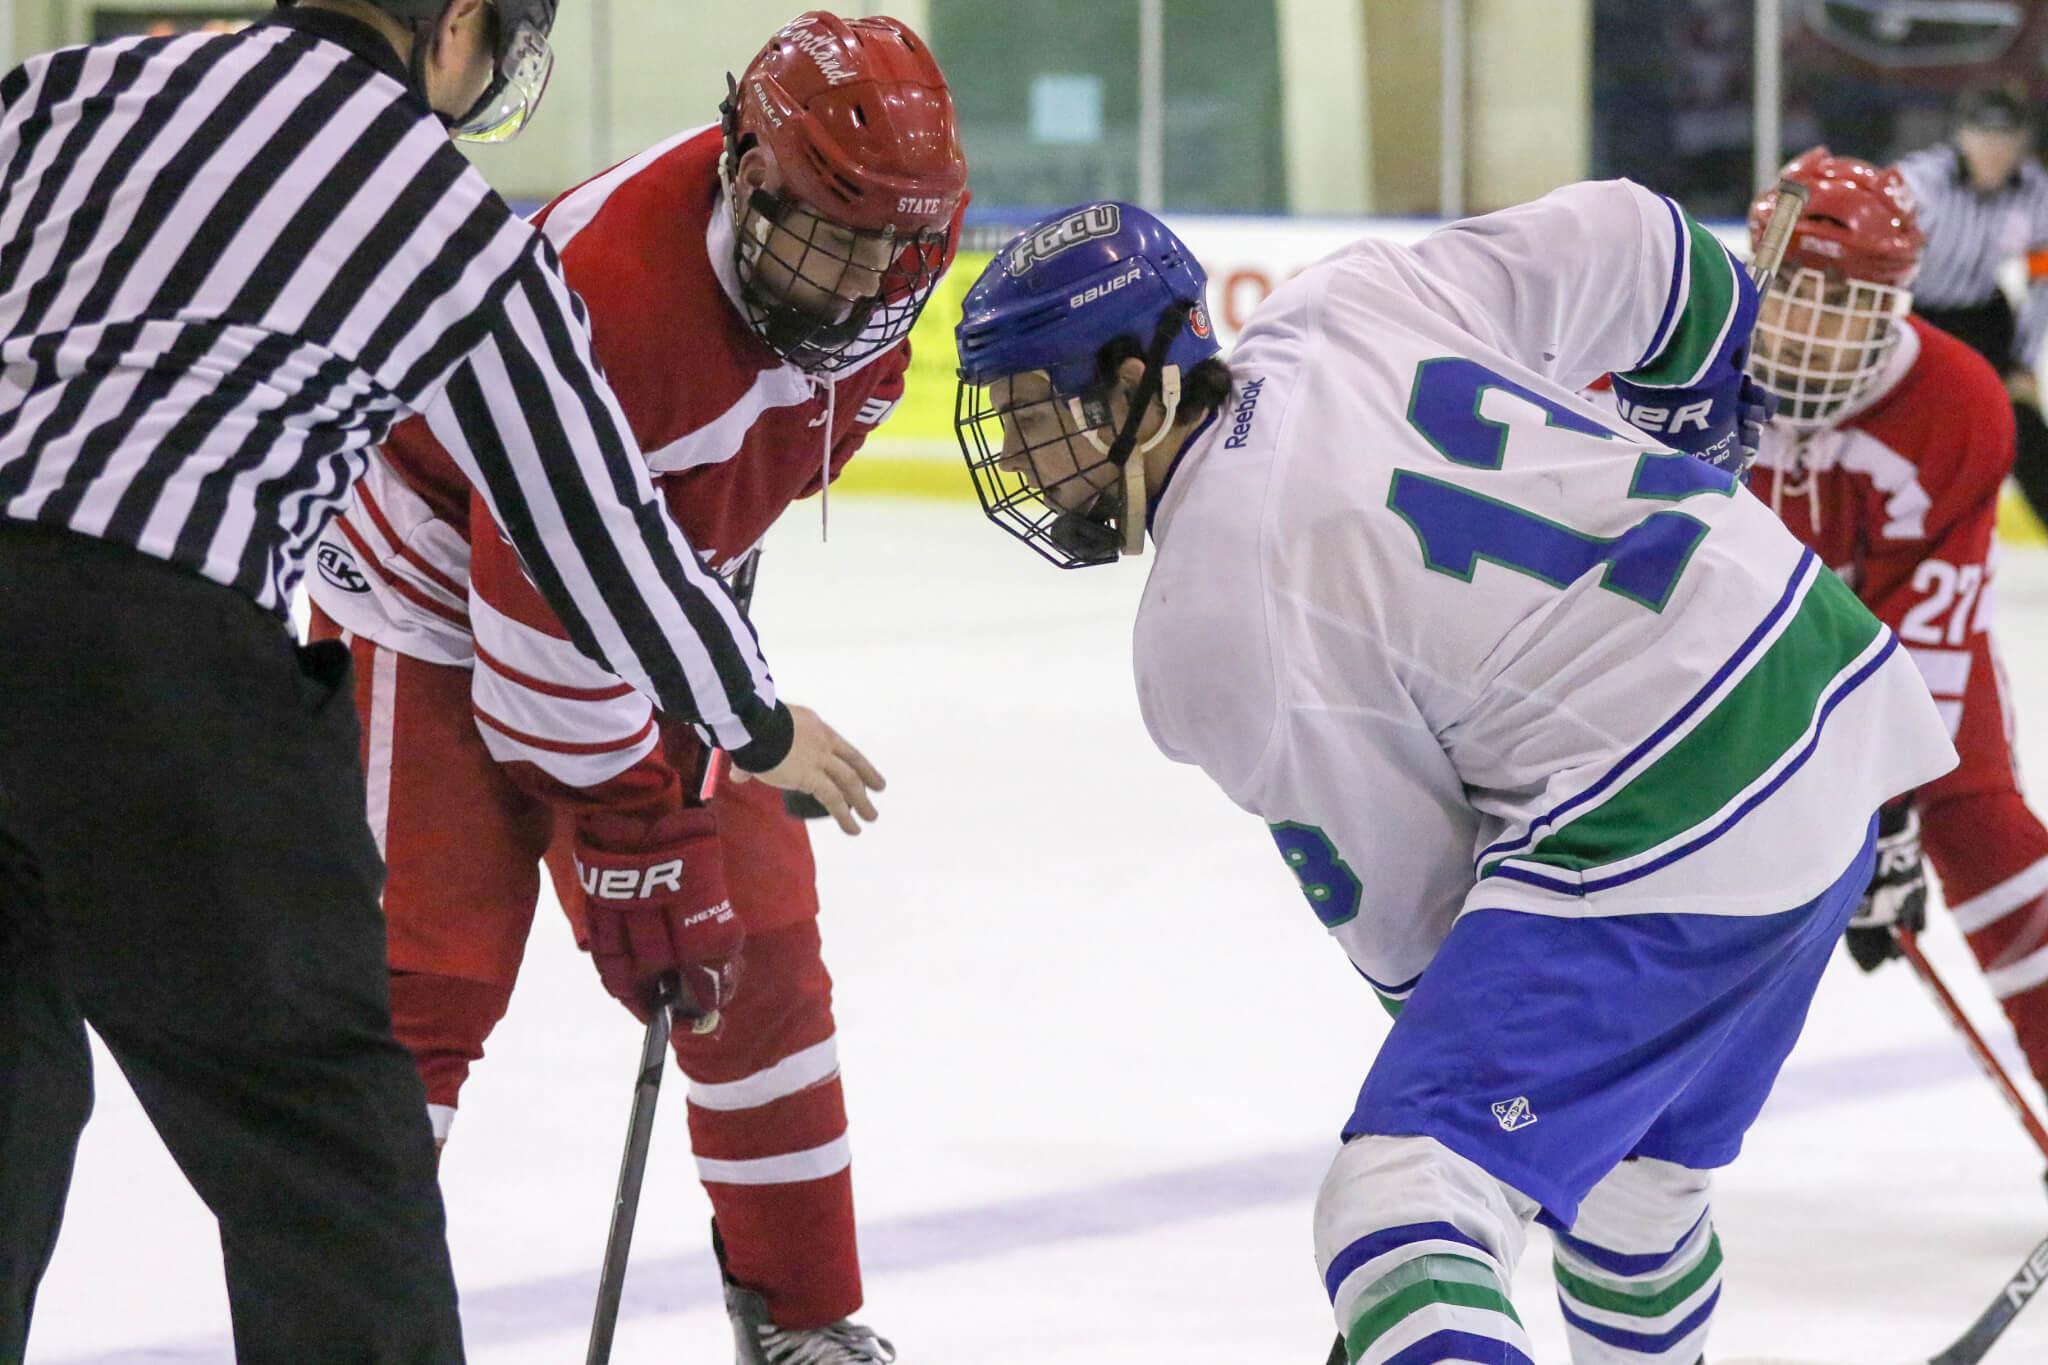 FGCU DII hockey looks ahead to the second half of the season